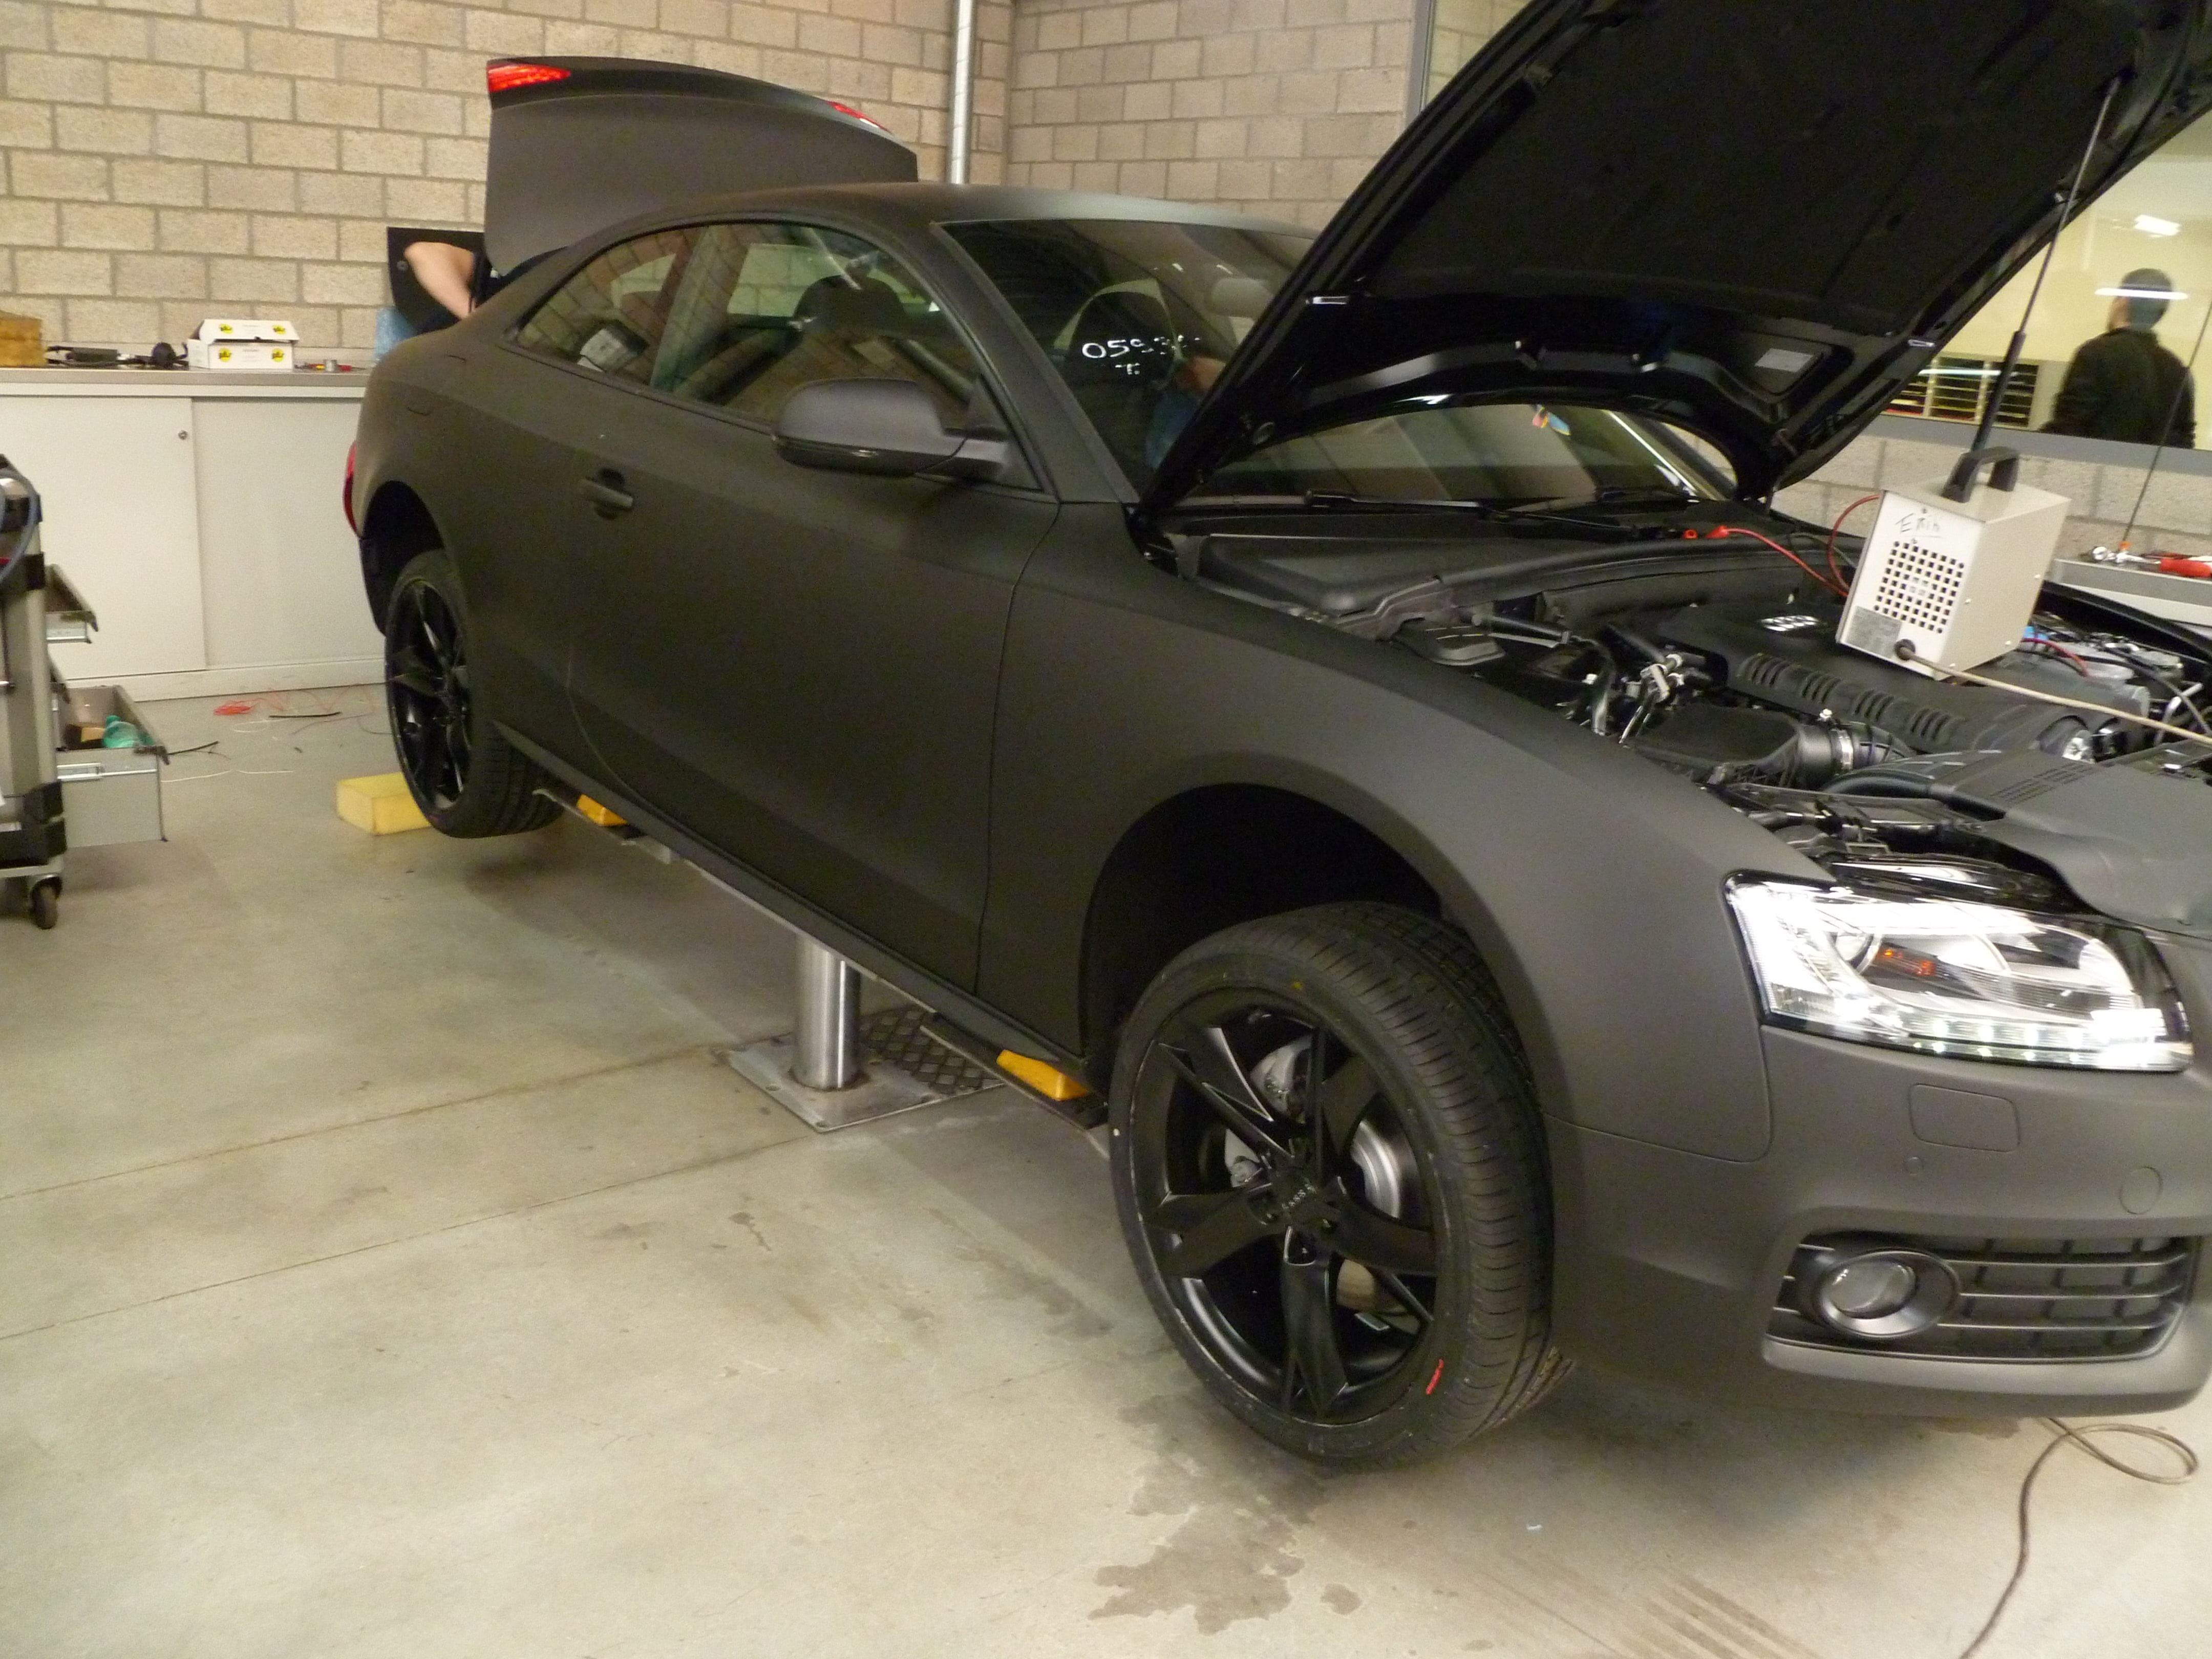 Audi A5 Coupe met Mat Zwarte Wrap, Carwrapping door Wrapmyride.nu Foto-nr:4649, ©2021